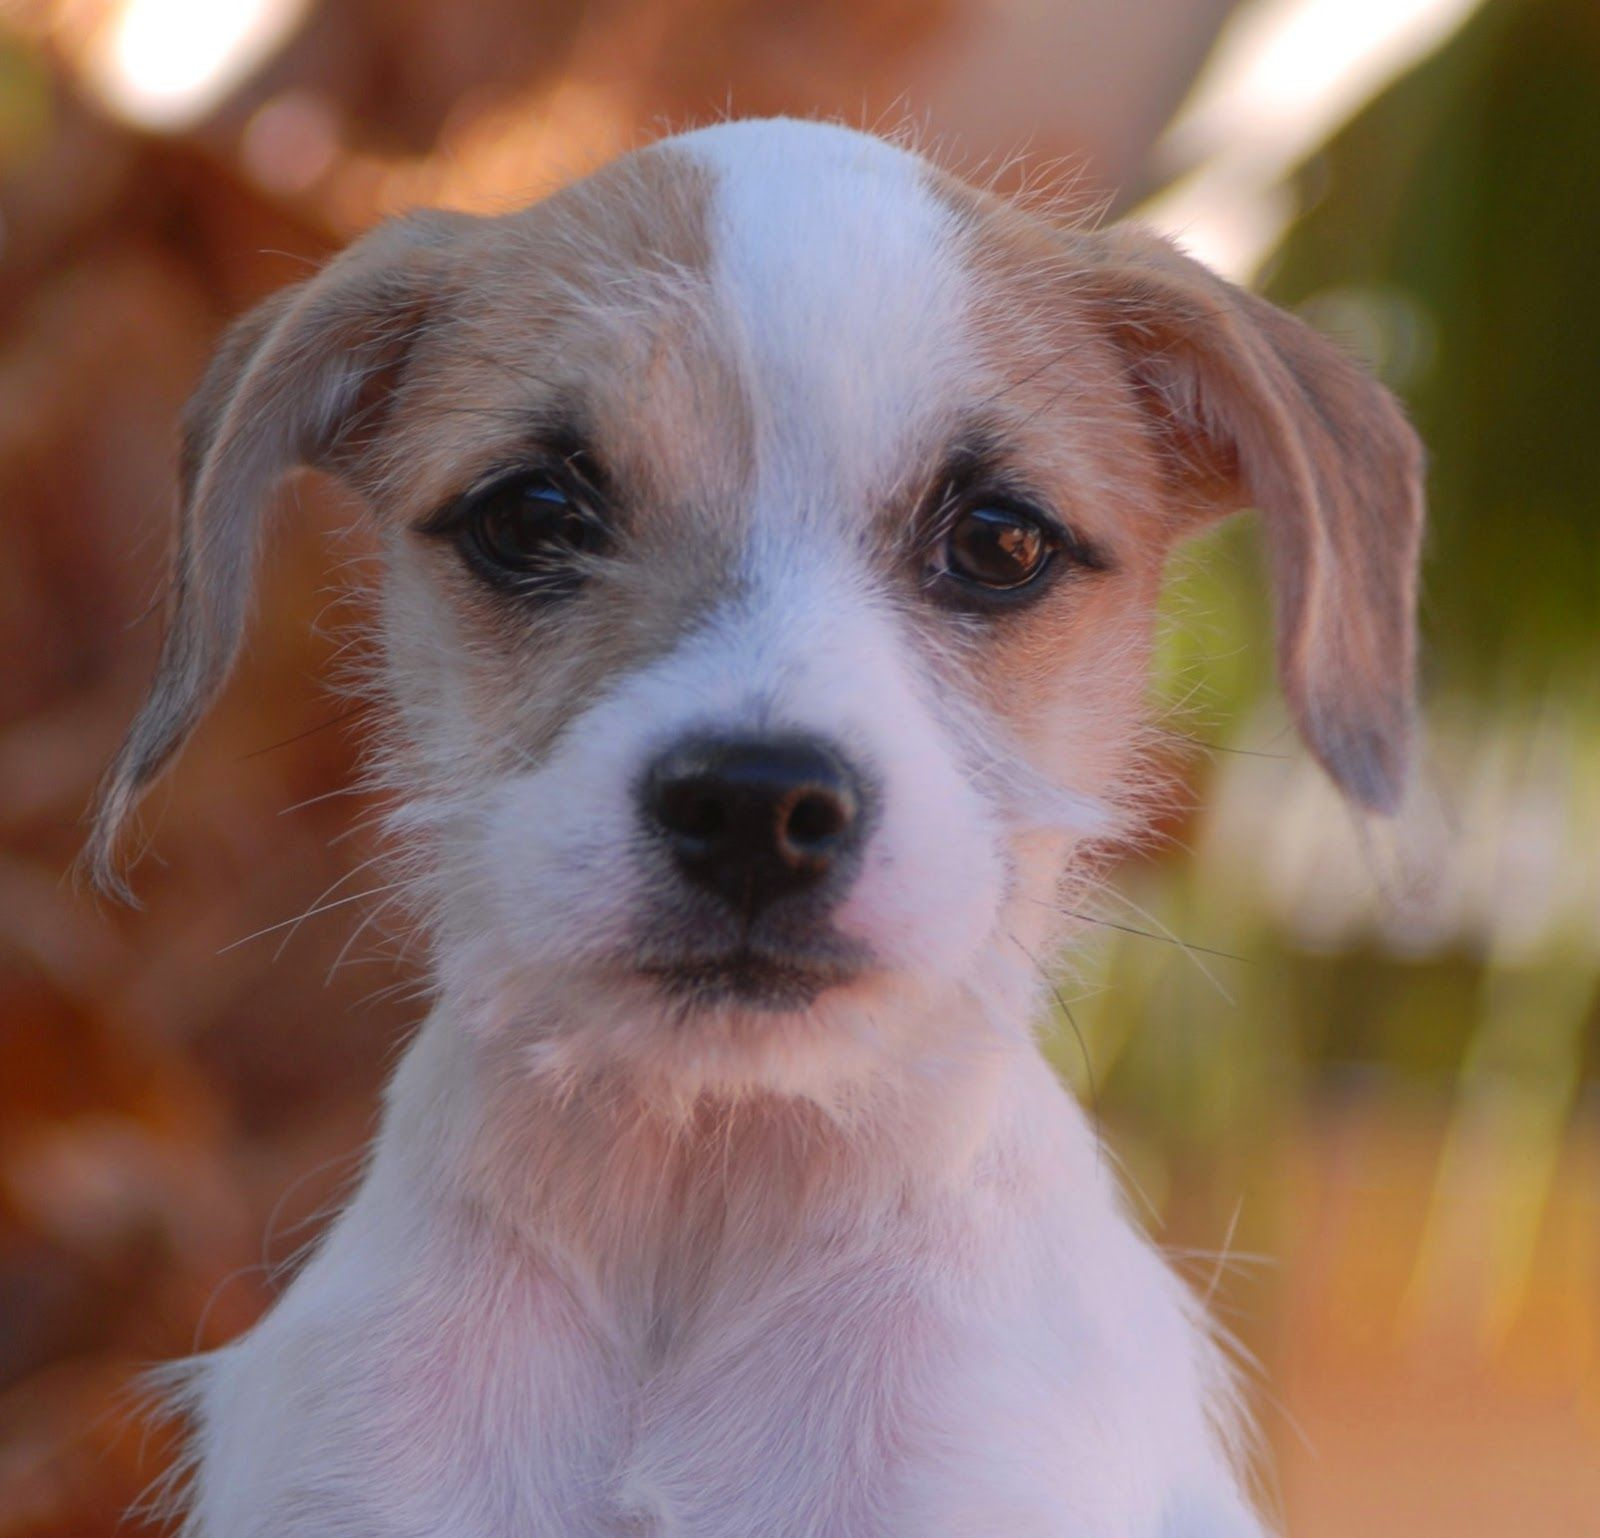 Savanna A Terrier Chihuahua Mix Puppy Chihuahua Mix Puppies Cute Animals Dog Adoption